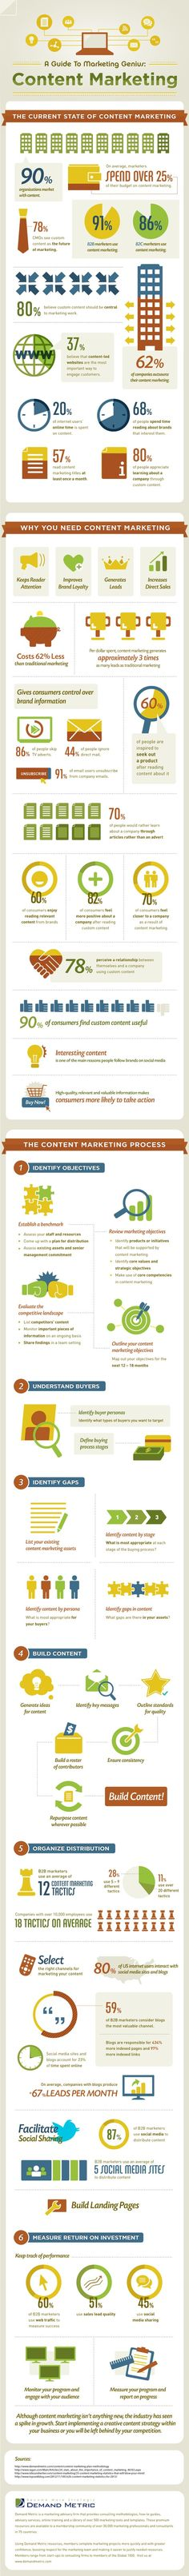 A Guide to Marketing Genius: Content Marketing, zdroj: http://www.demandmetric.com/content/content-marketing-infographic